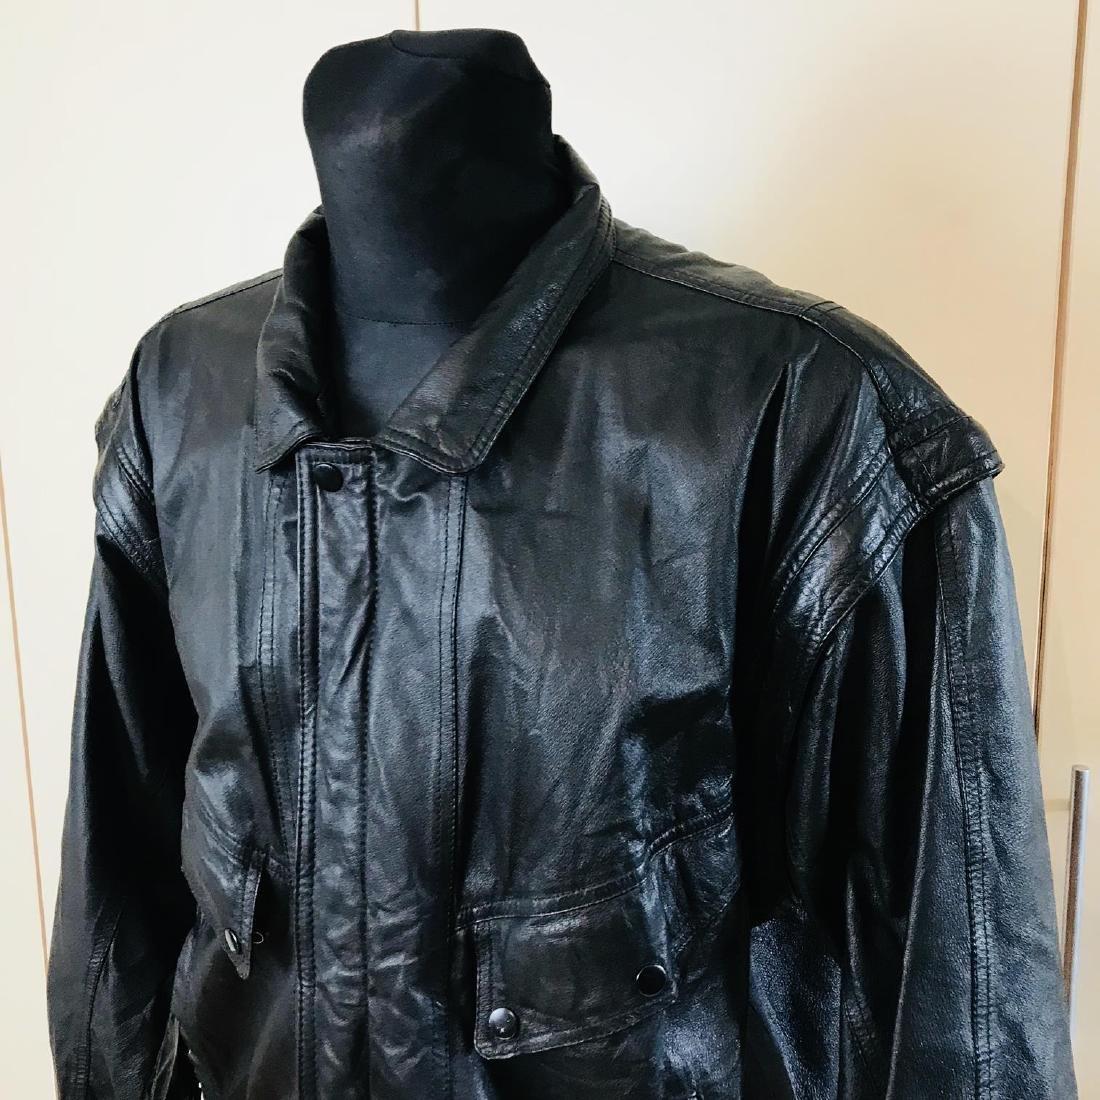 Vintage Men's Boecker Leather Jacket Size US 42 - 2